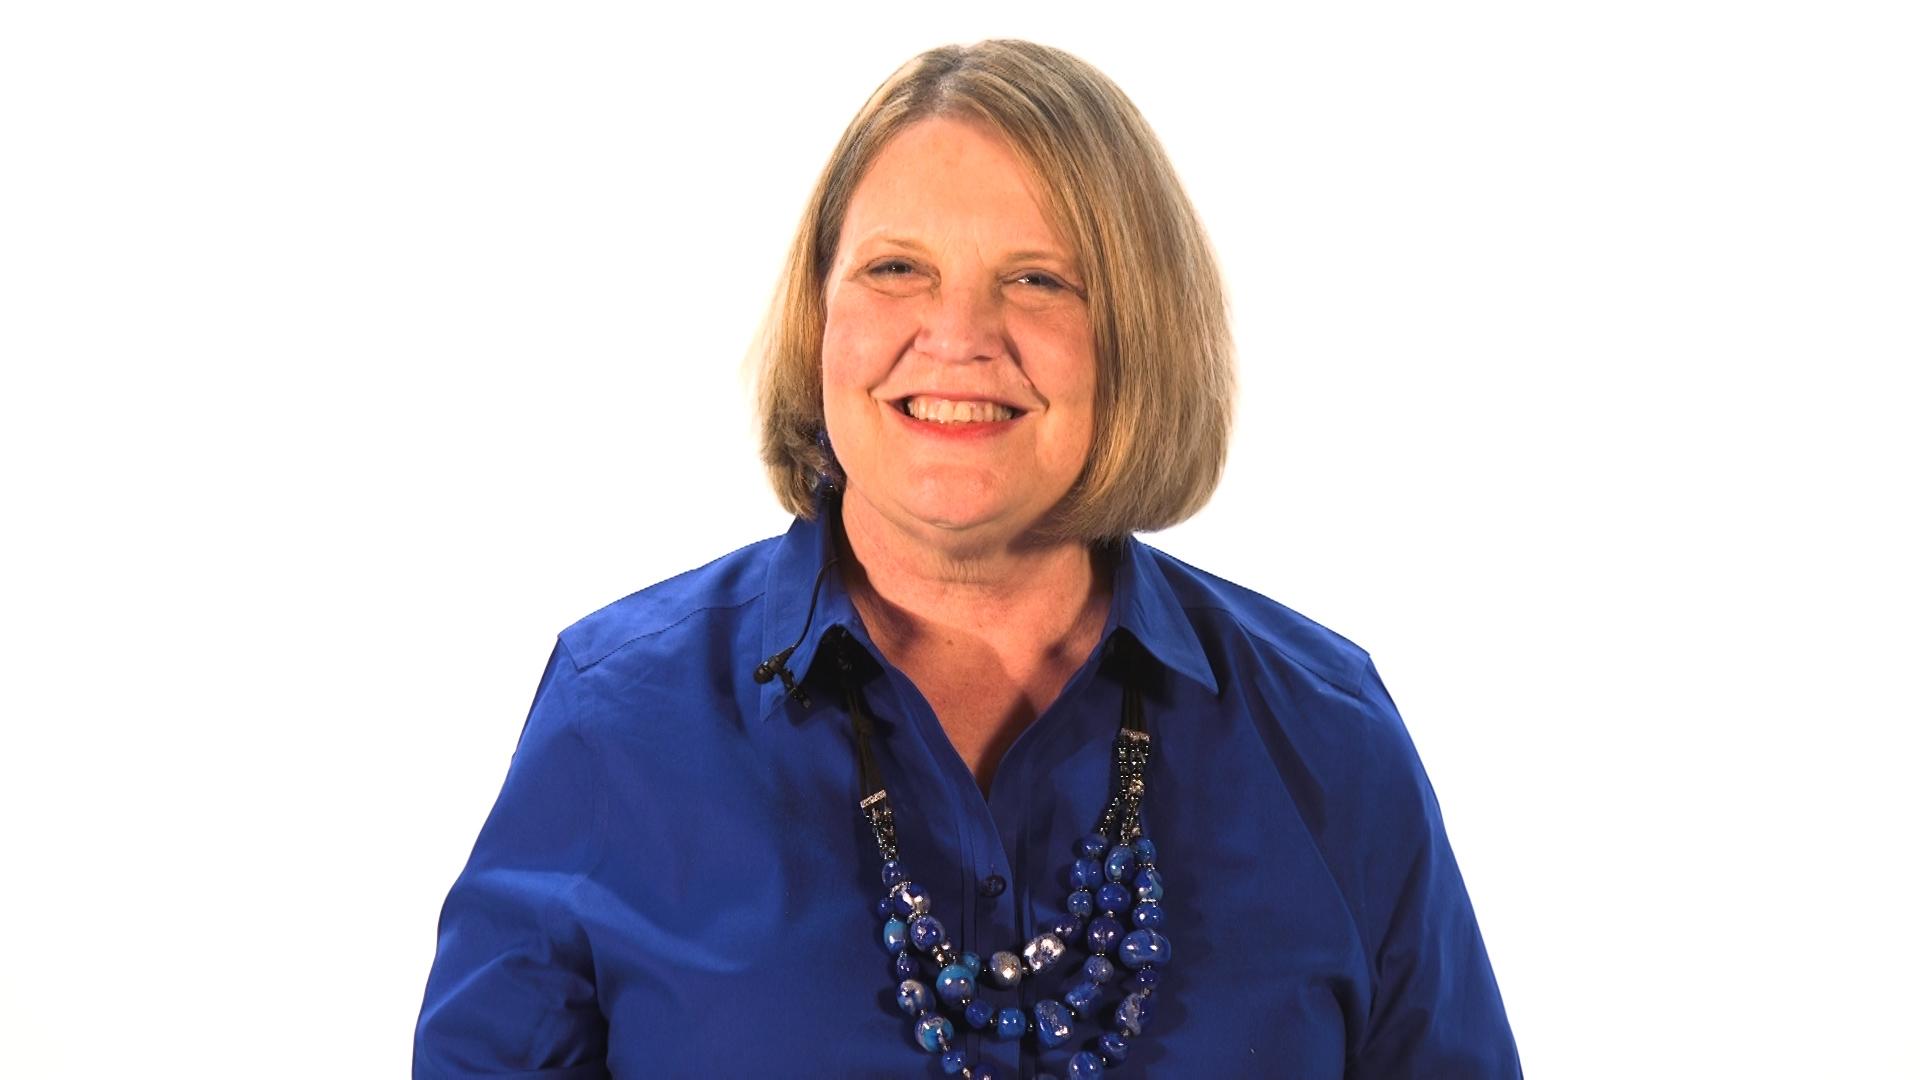 Sylvia Diehl, Ph.D., CCC-SLP